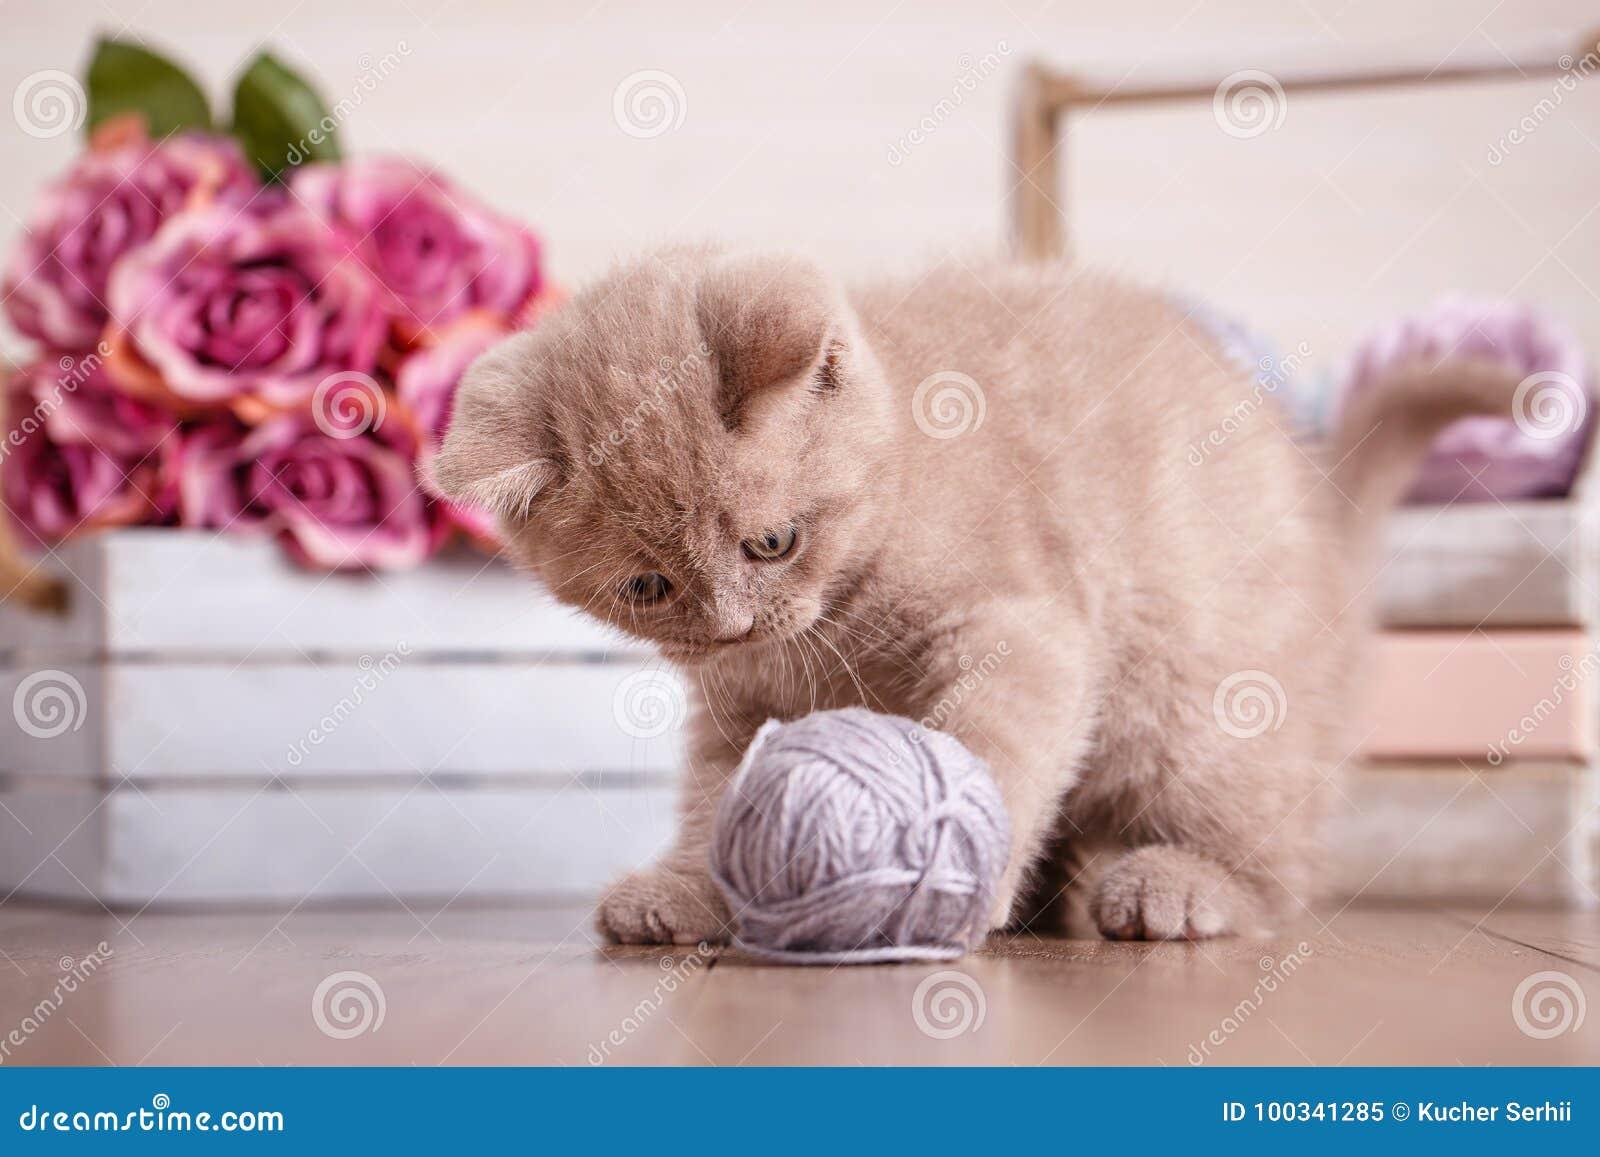 d293d650b4a2 Αυταράς παιχνίδια γατακιών Γάτα της Σκωτίας